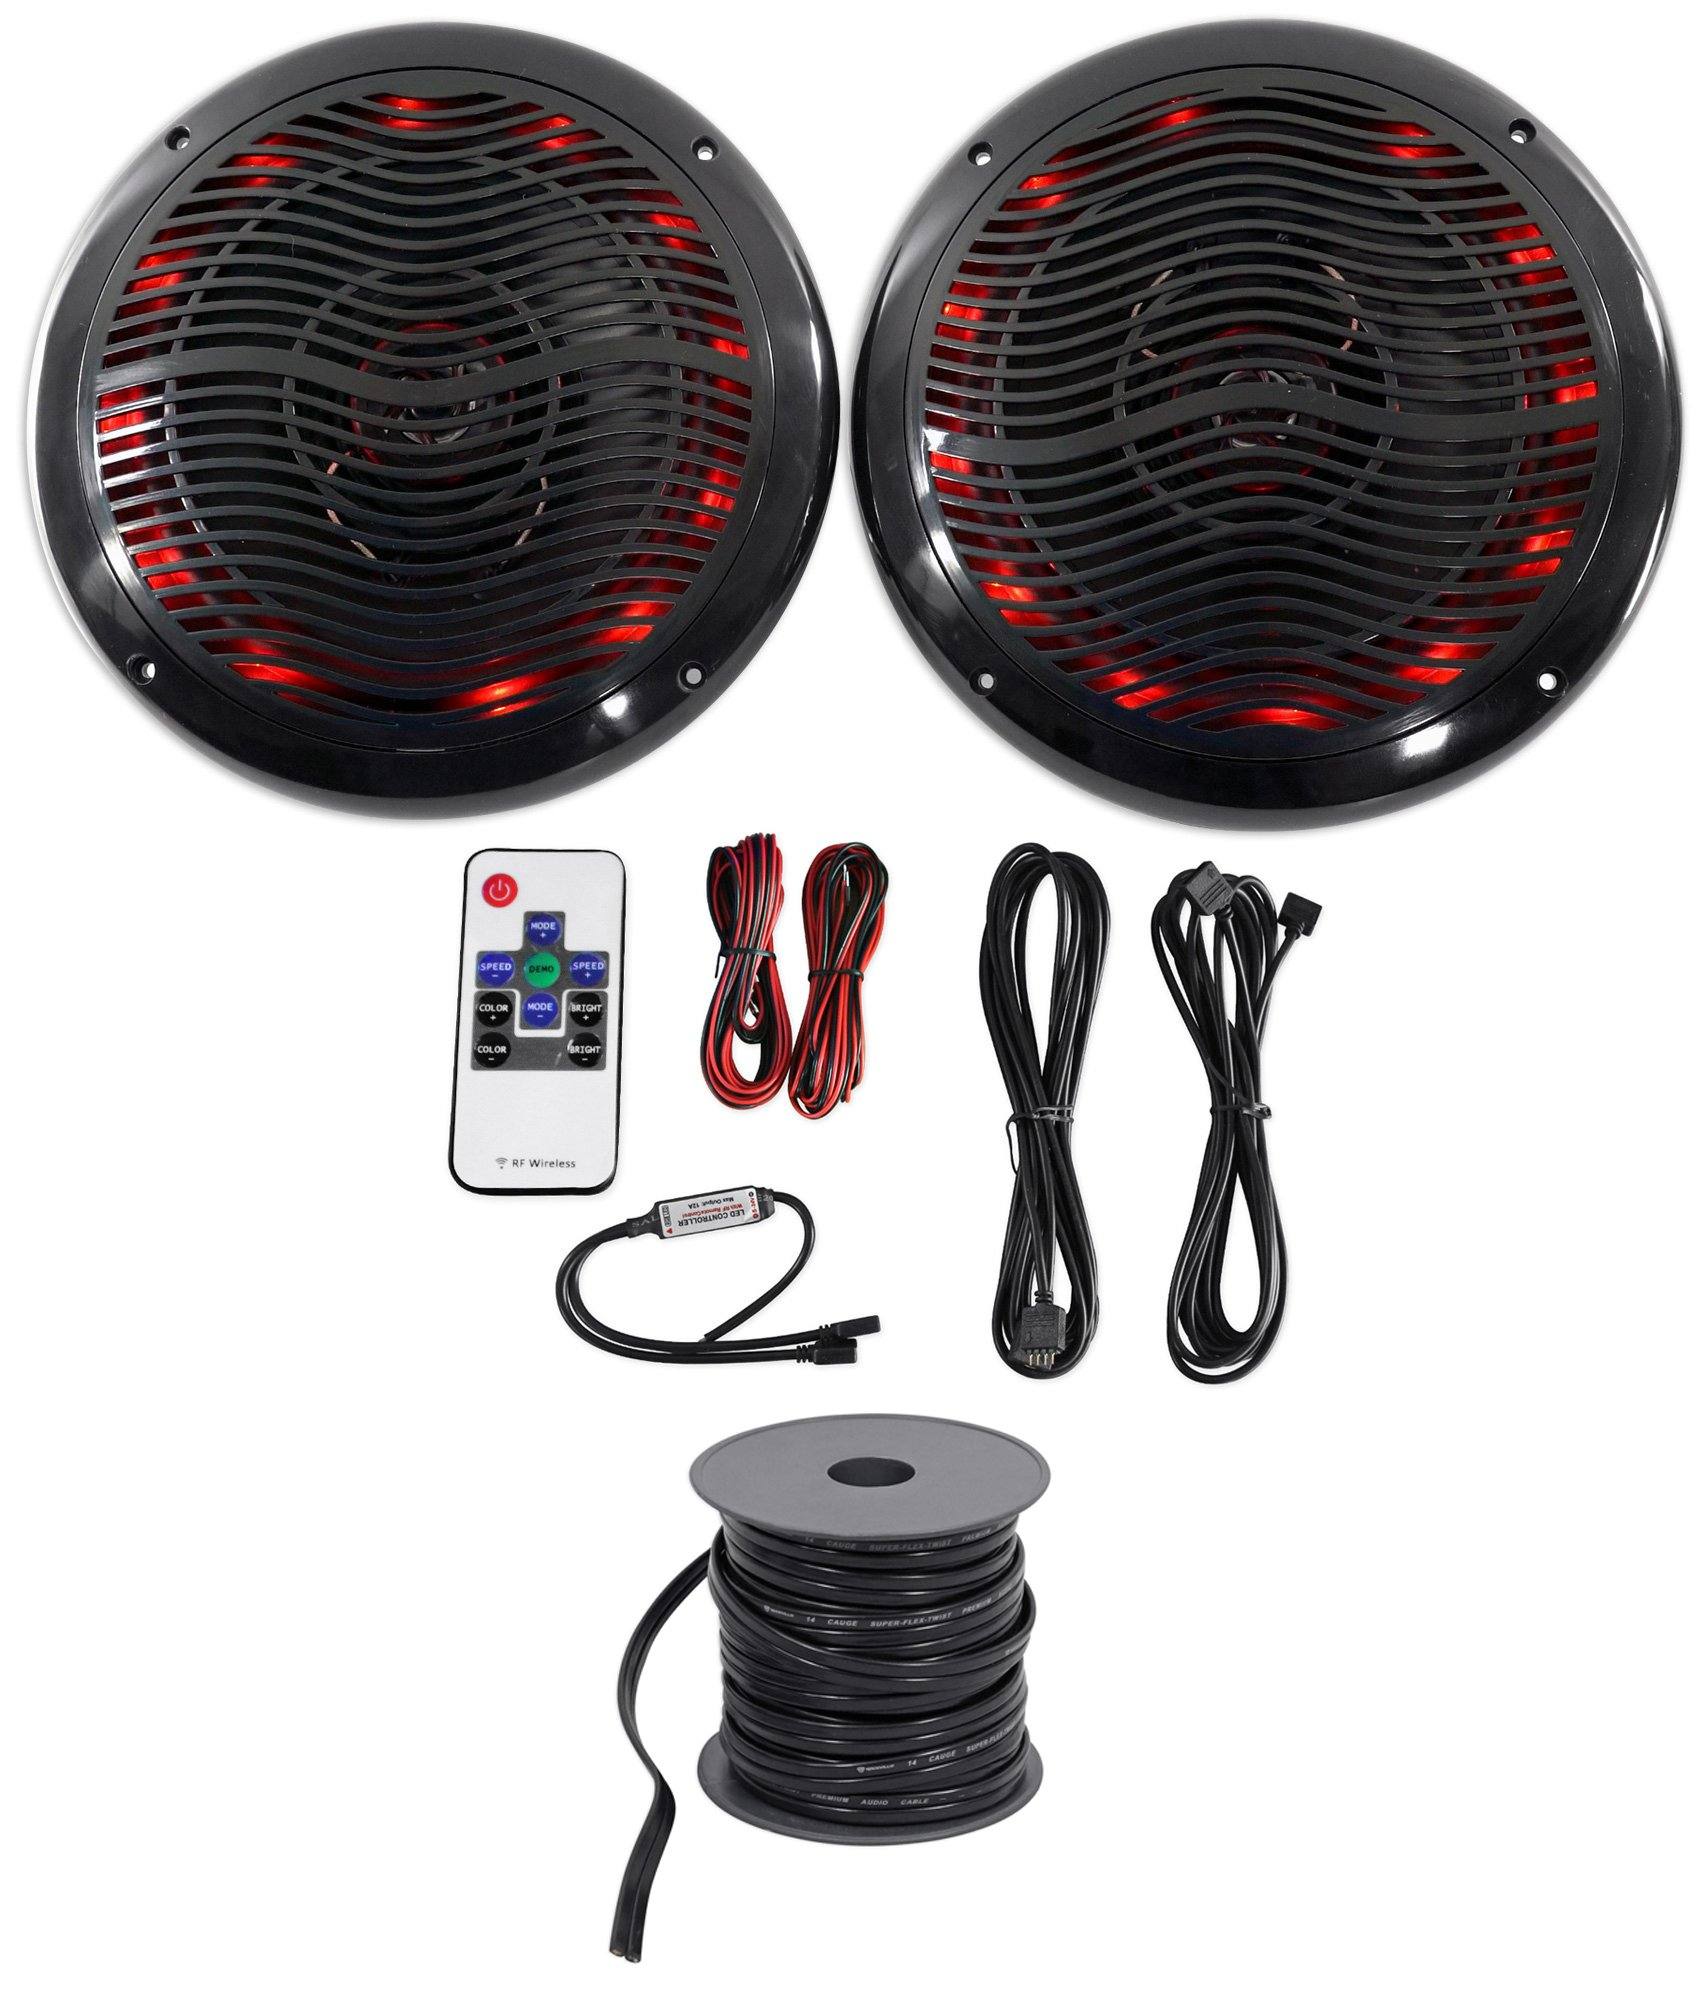 Rockville 2 6.5'' 600w ATV/UTV/RZR/CART/Polaris Speakers+Multi Color LED+Remote